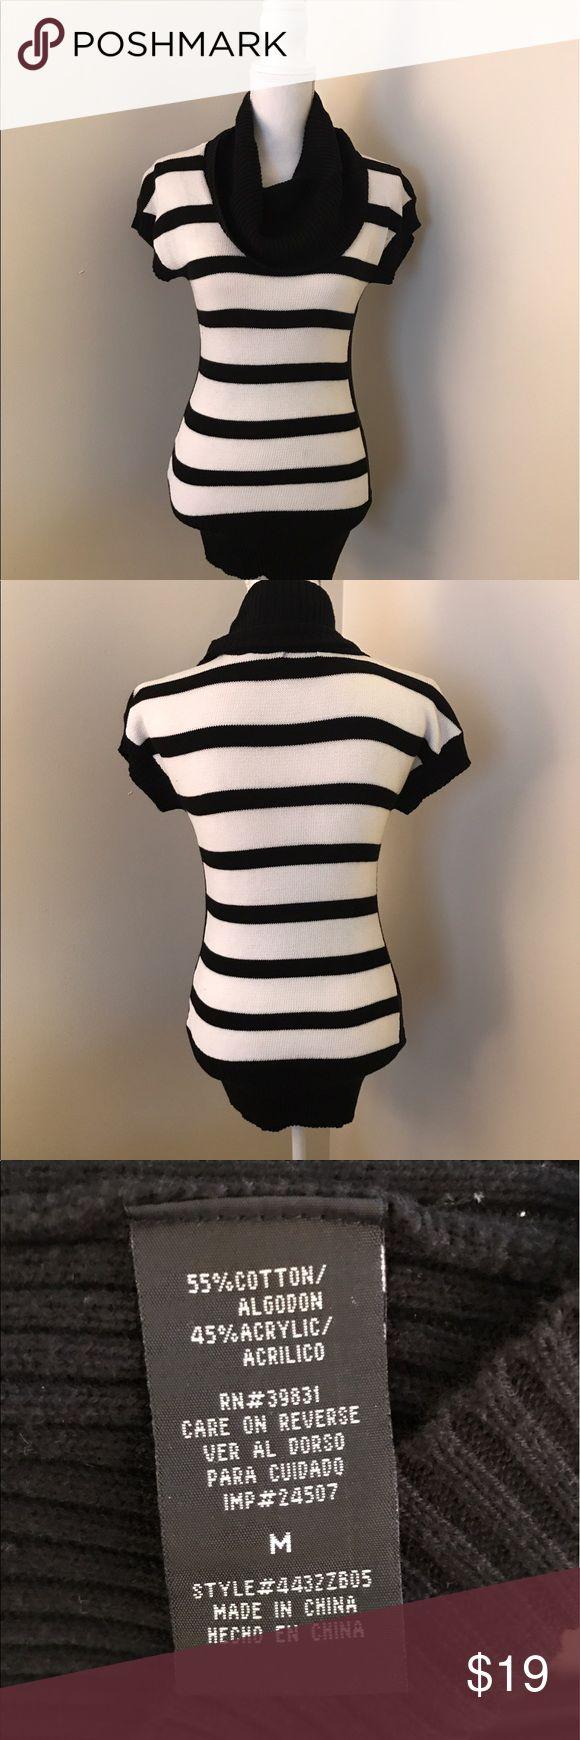 Women's Black and White Short Sleeve Sweater Long Short Sleeve Sweater. Great business casual option. Sweaters Cowl & Turtlenecks